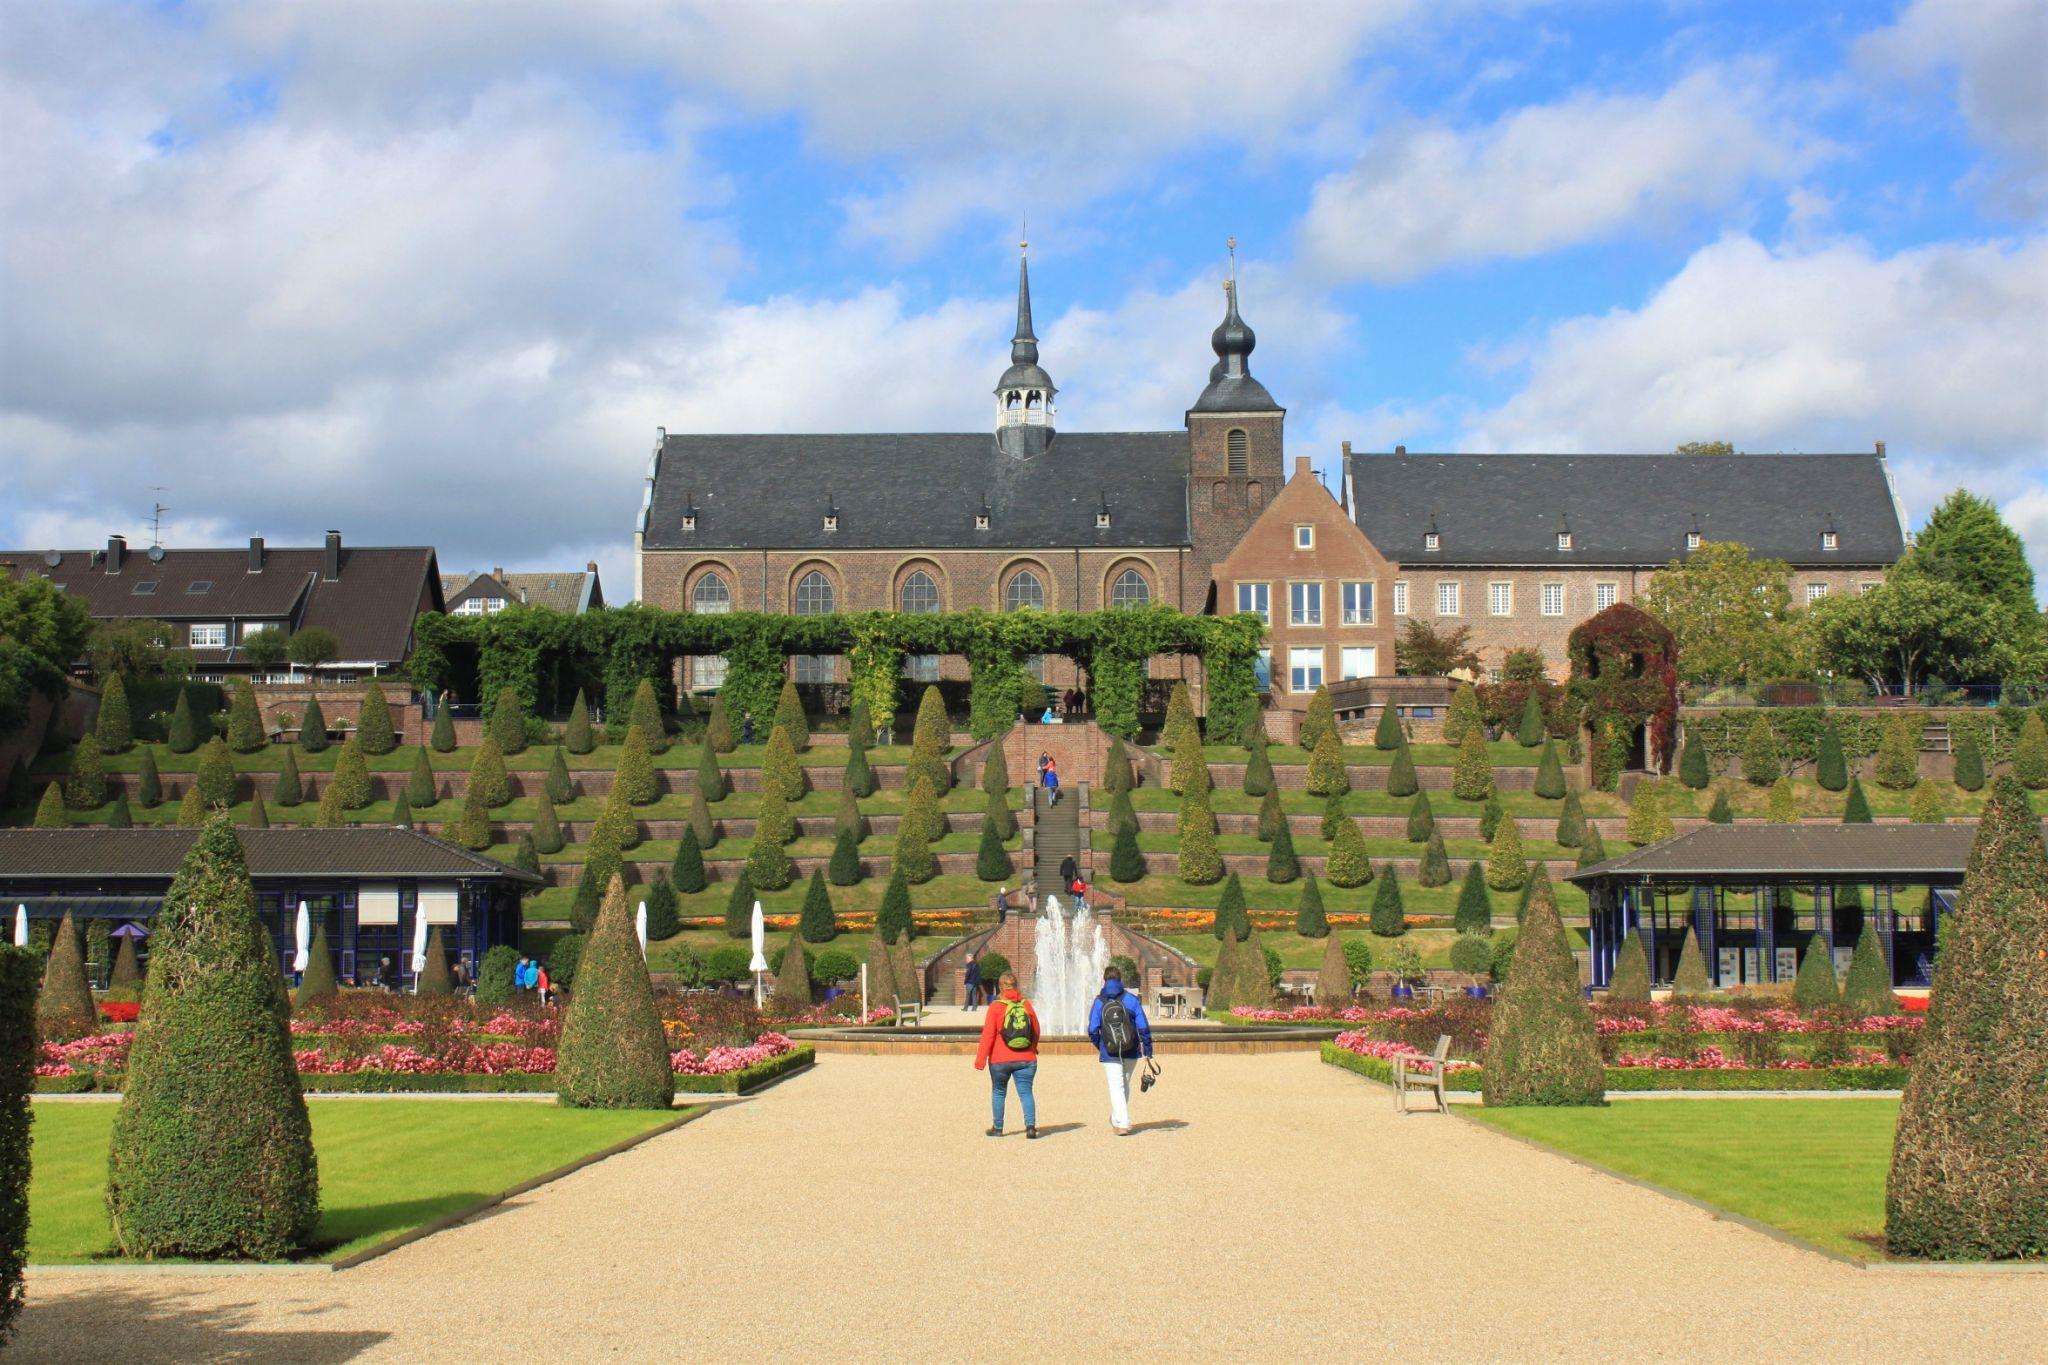 Kloster Kamp, Germany